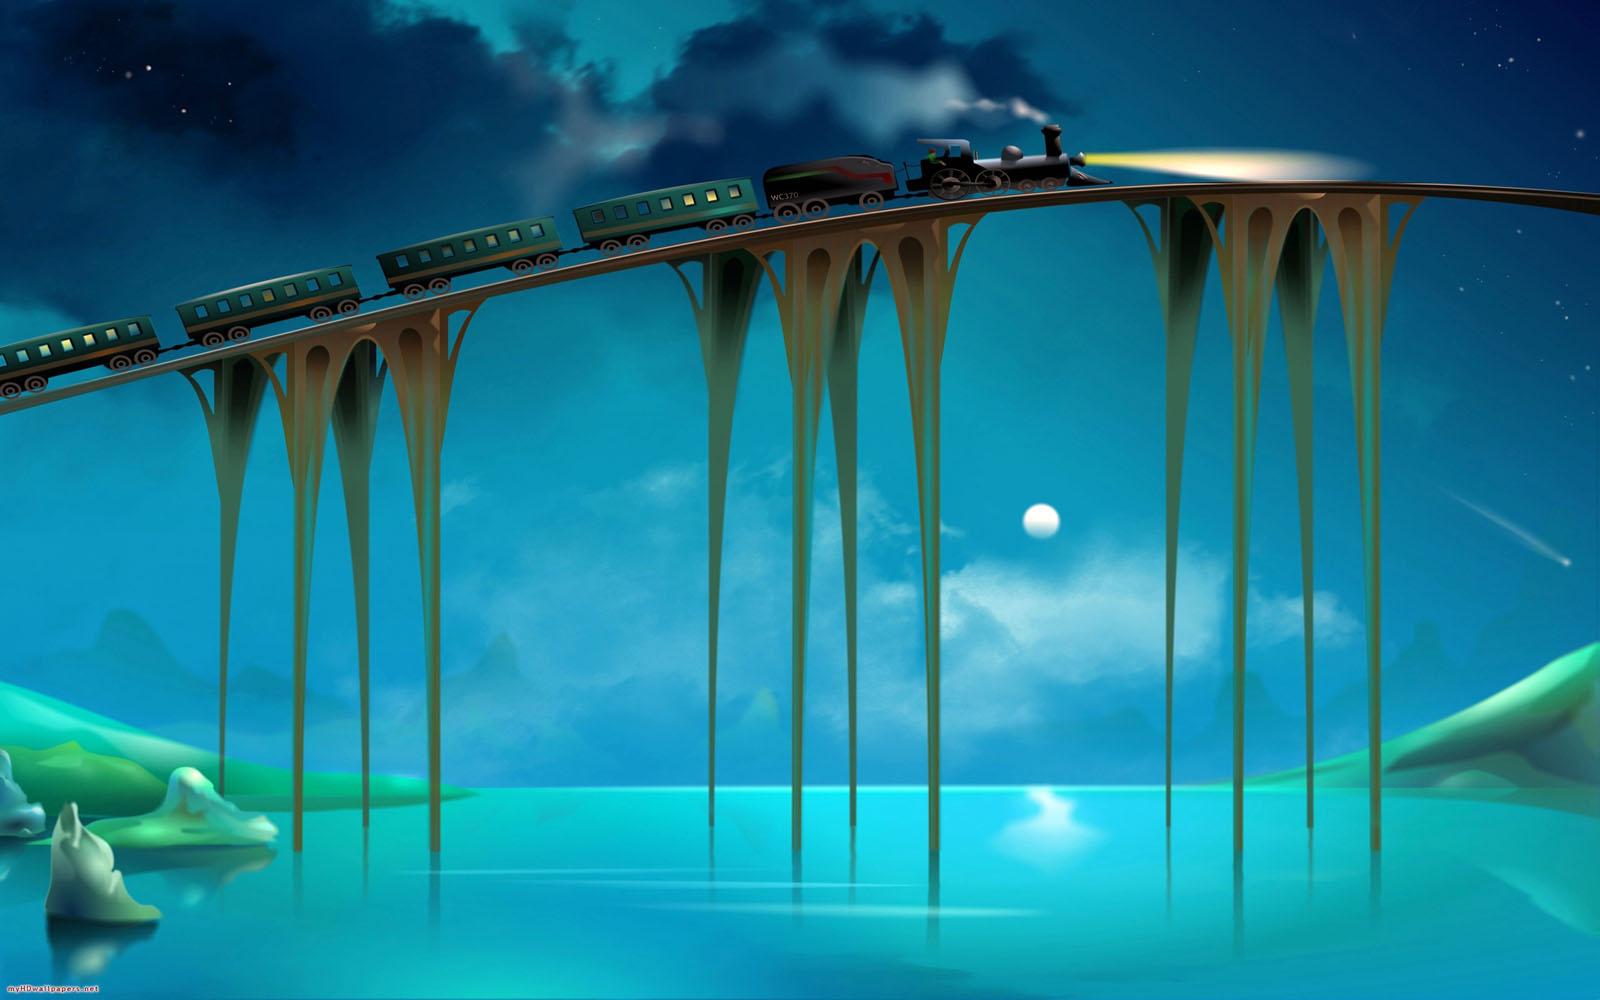 Amazing Train Journey Wallpaper 1600x1000